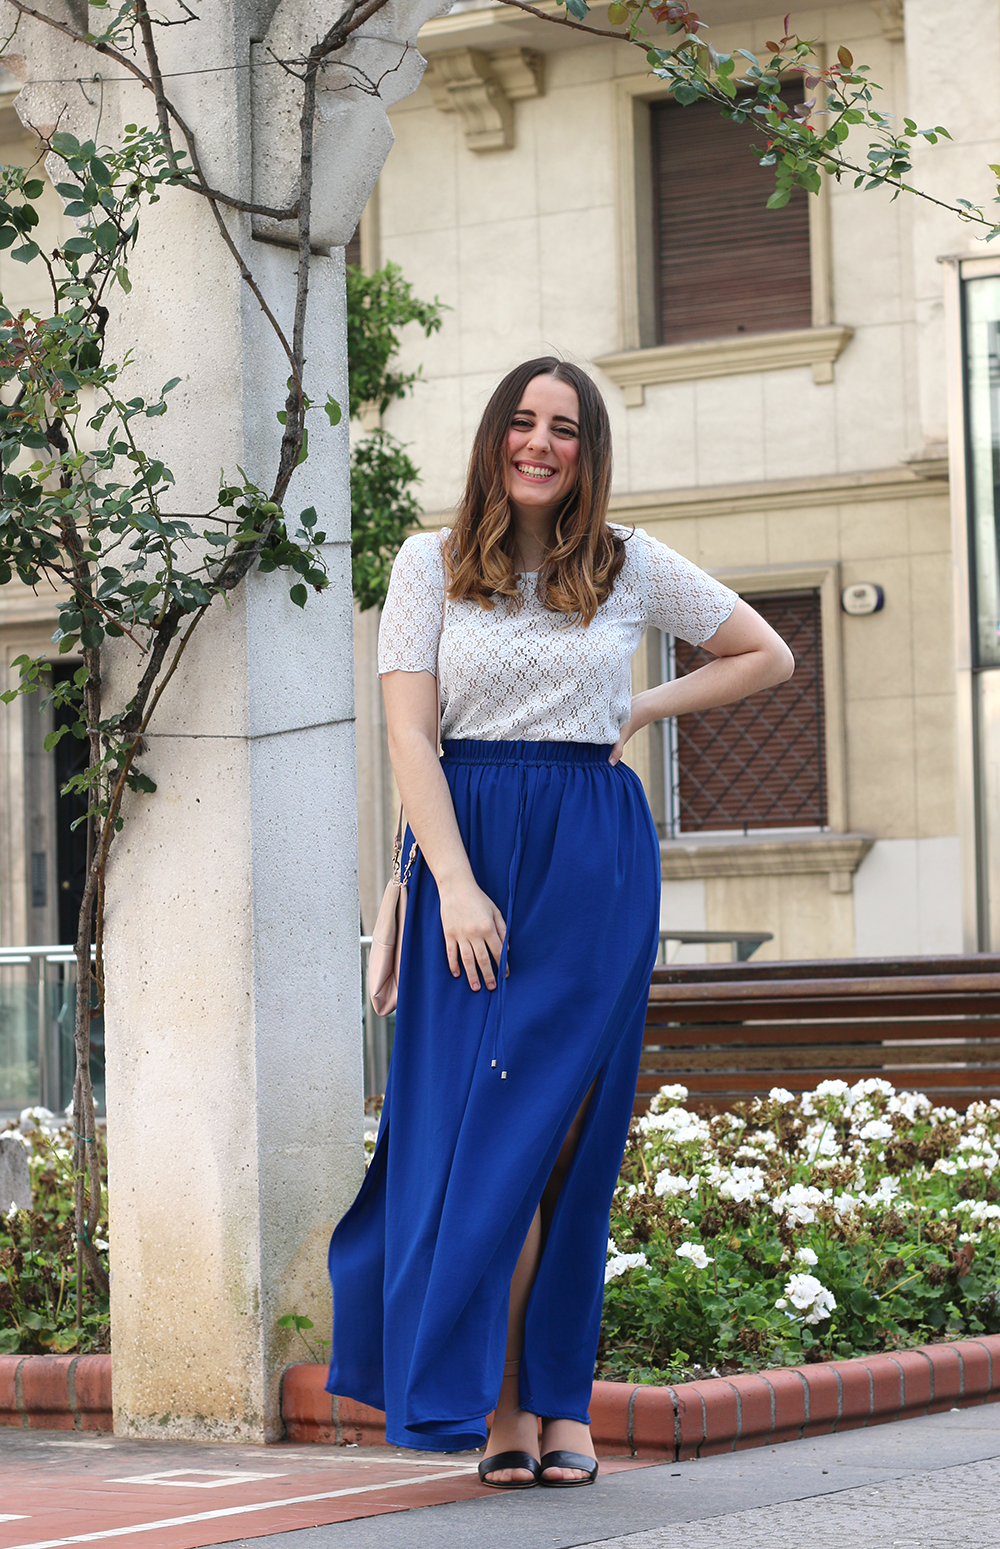 0963d9bb1b Largas Bloguera A Wardrobe My Y Vuelta Faldas Las Me Myself qpxtBSw